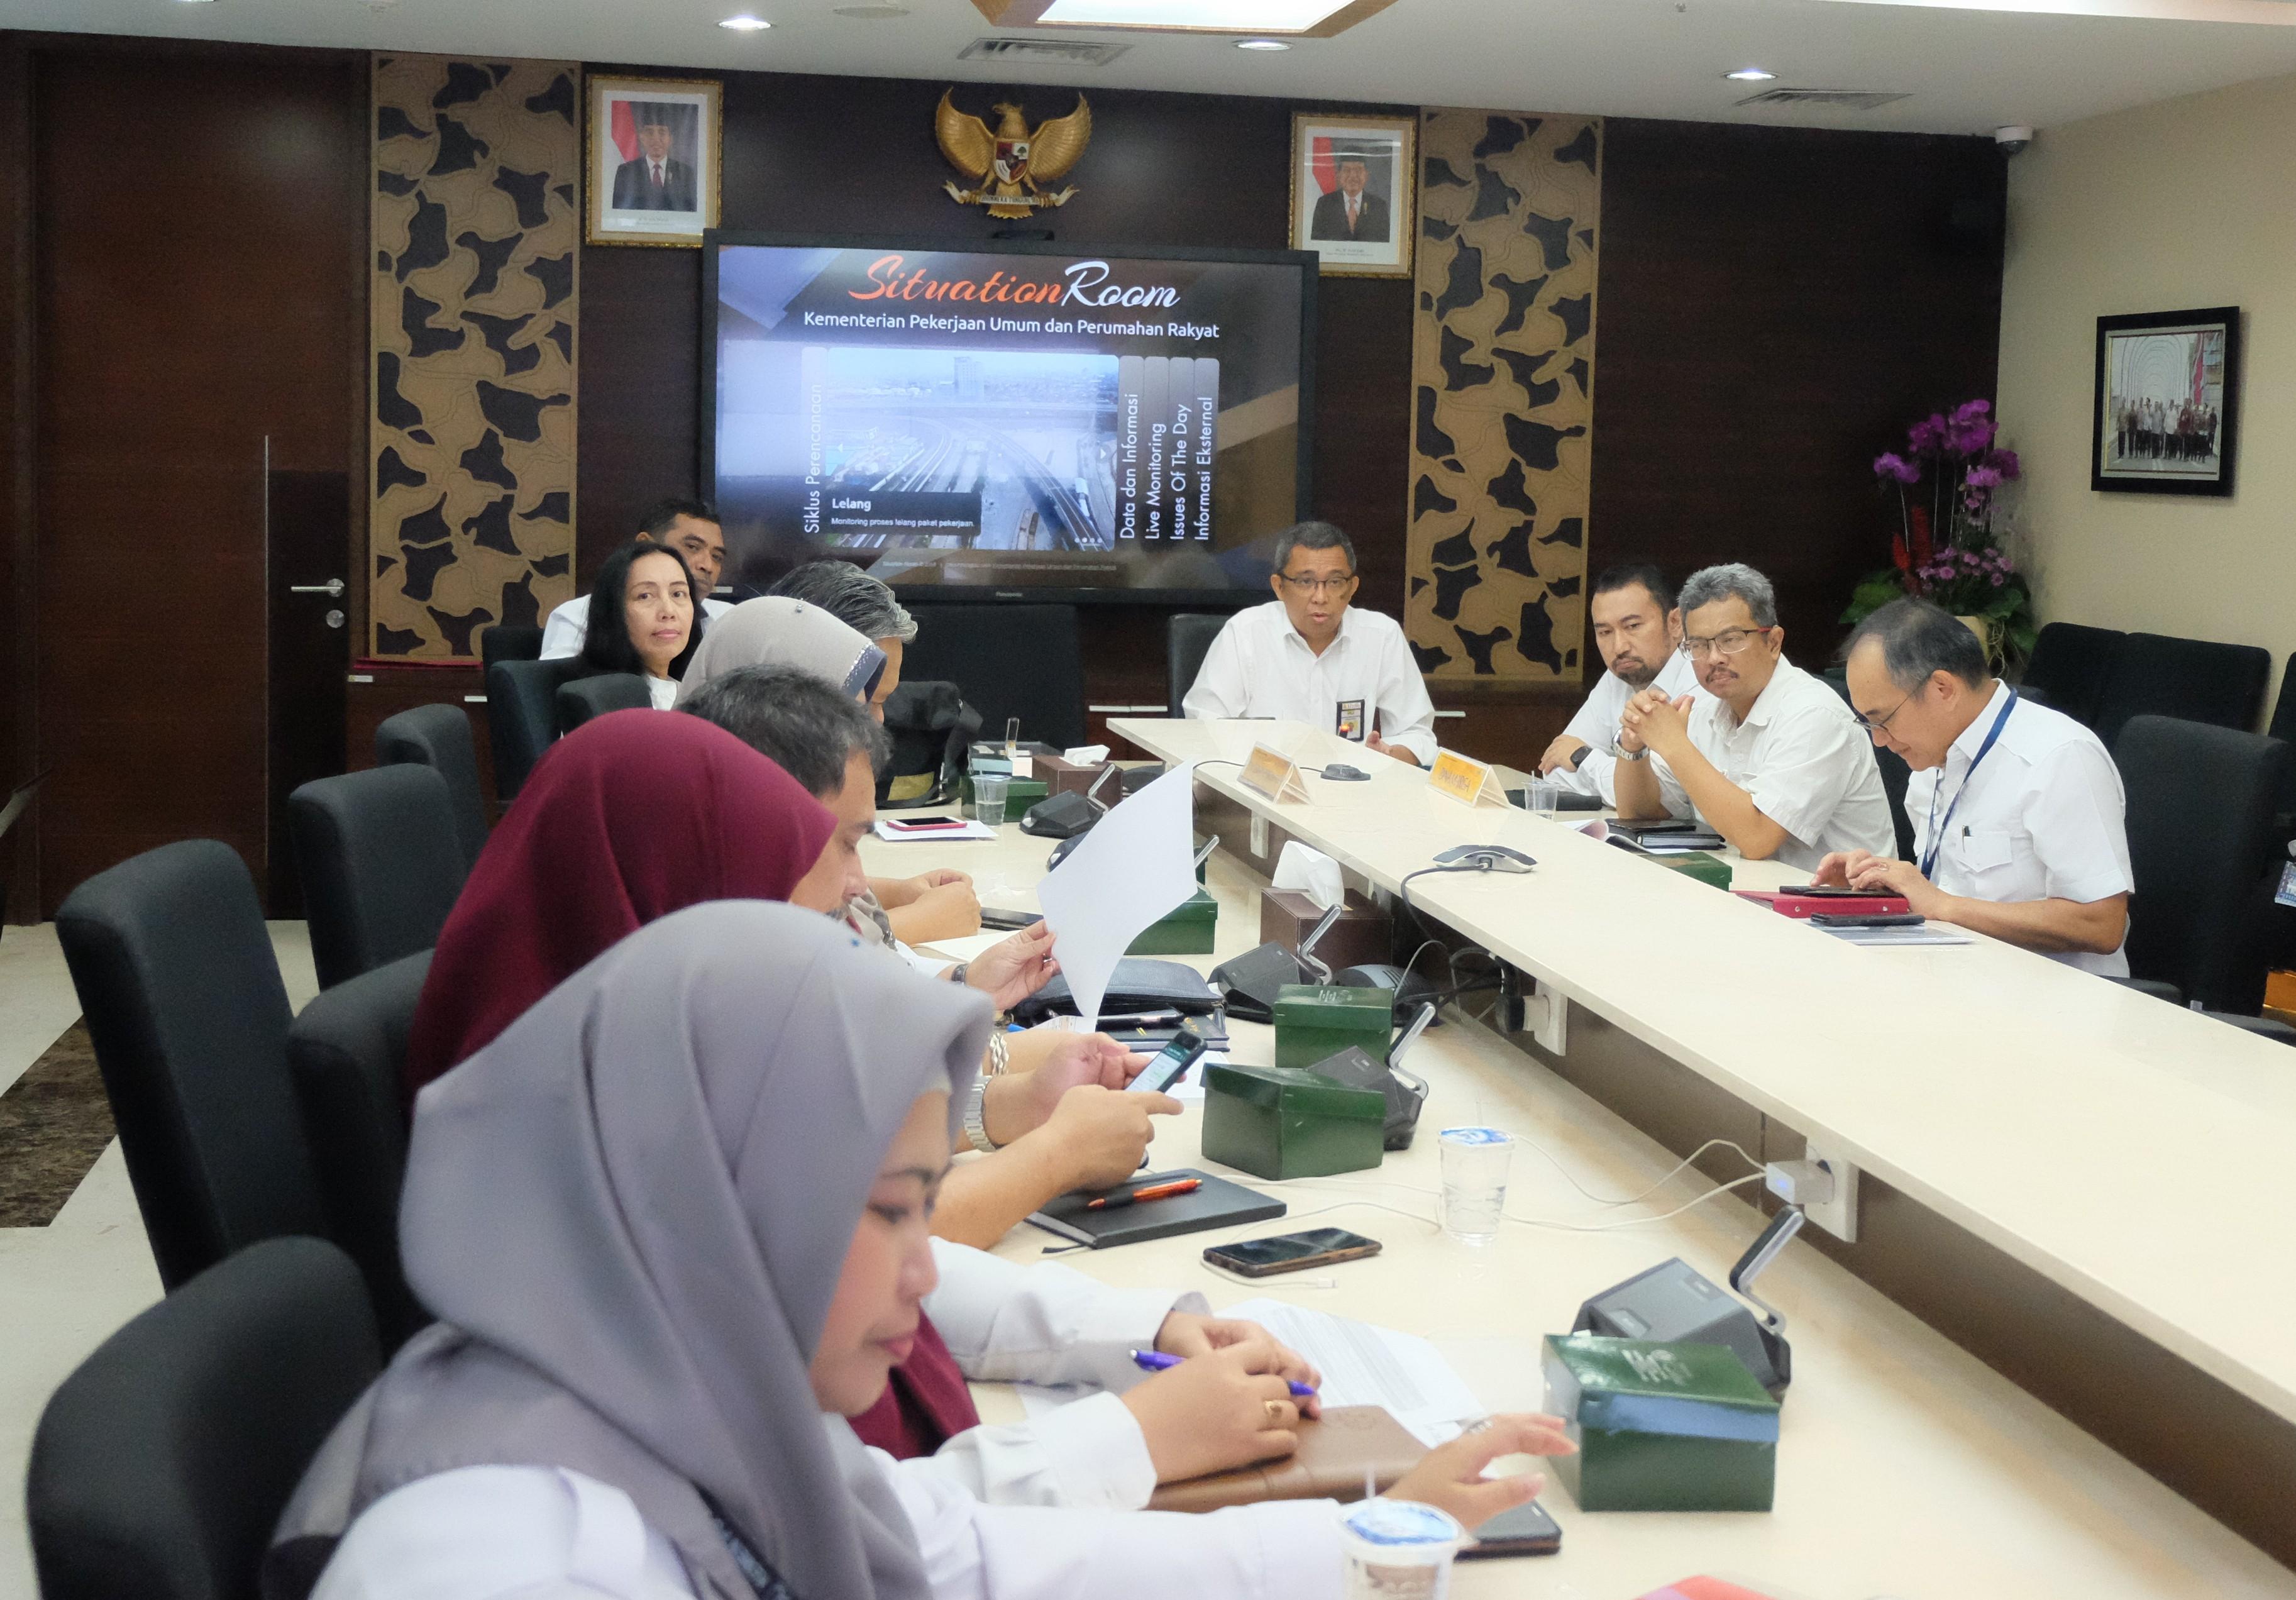 Kementerian PUPR Kembali Gelar Konreg Jarak Jauh